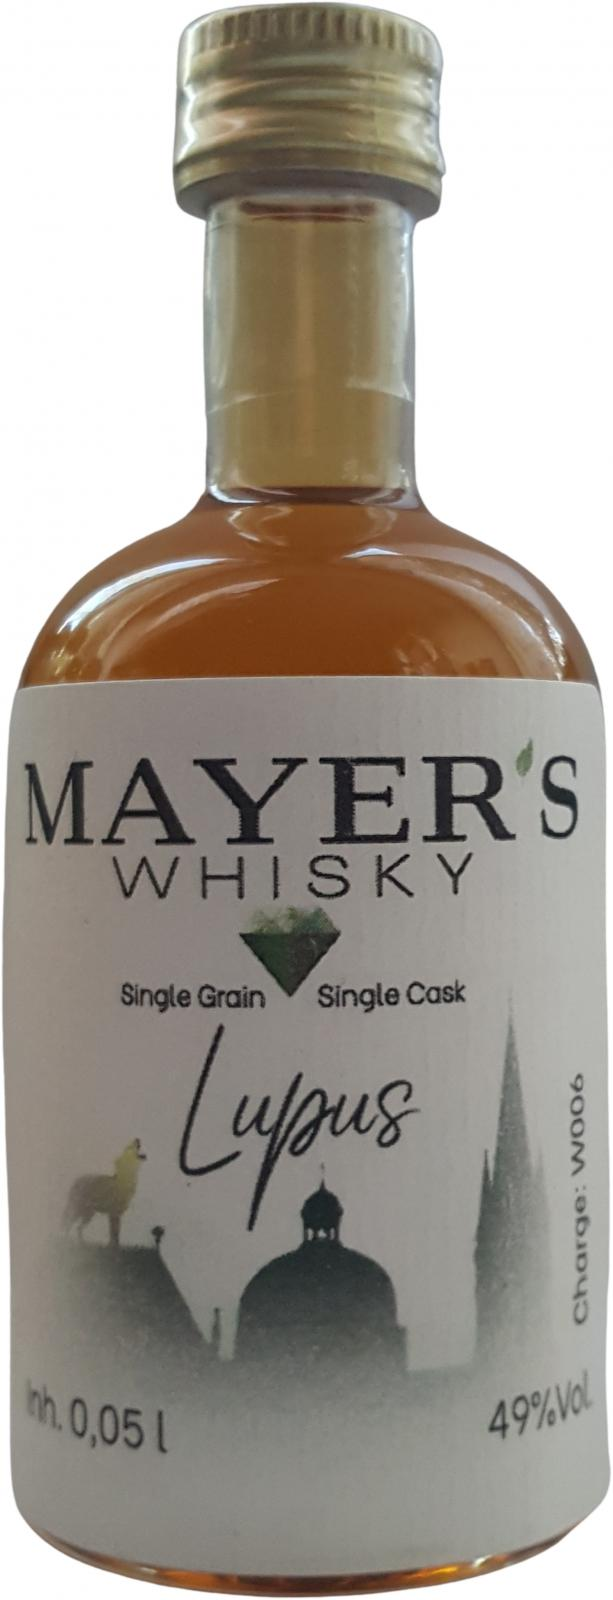 Mayer's 2016